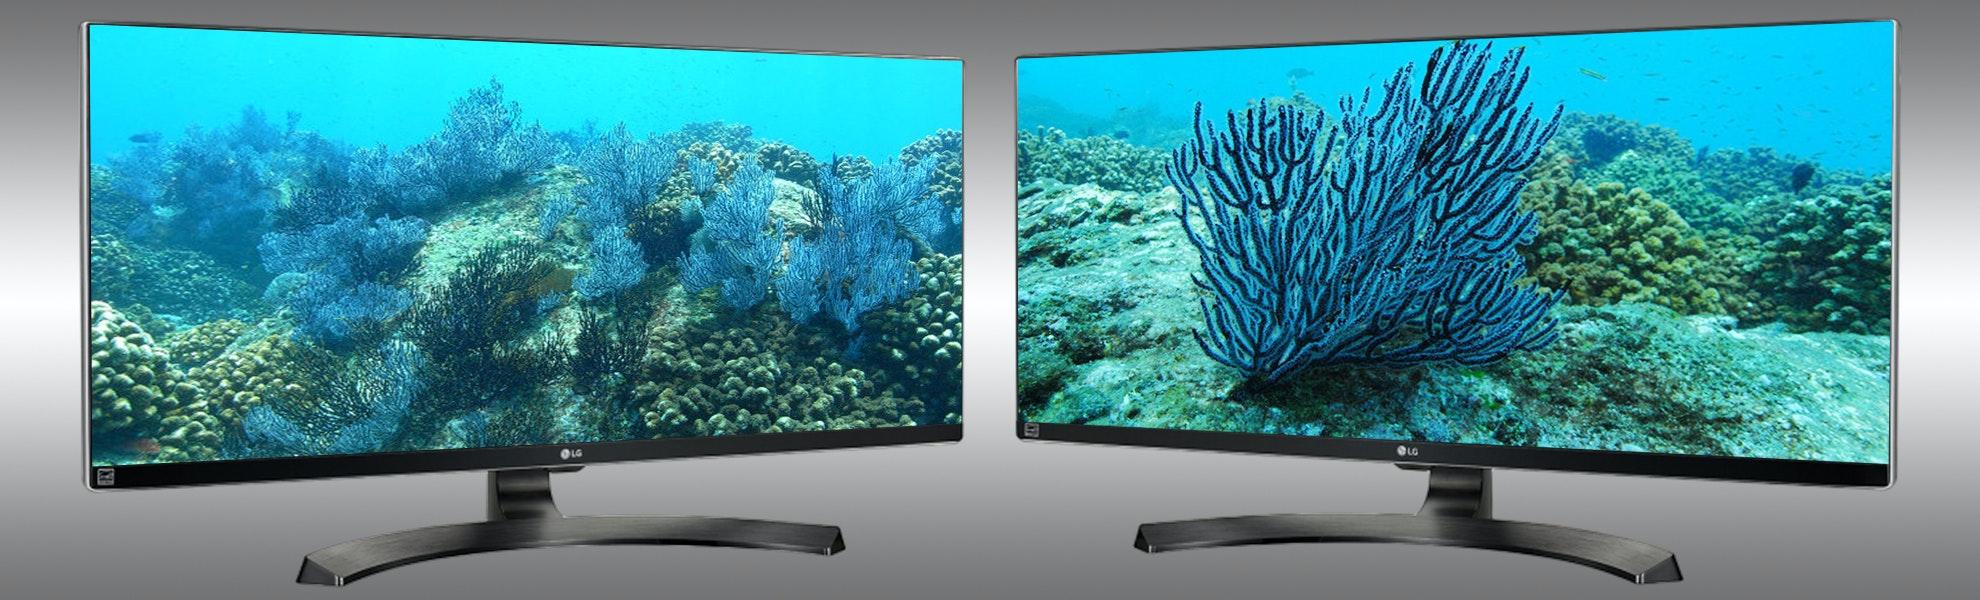 "LG 34"" Ultra Wide 1440p 21:9 Monitor 34UM88C-P"